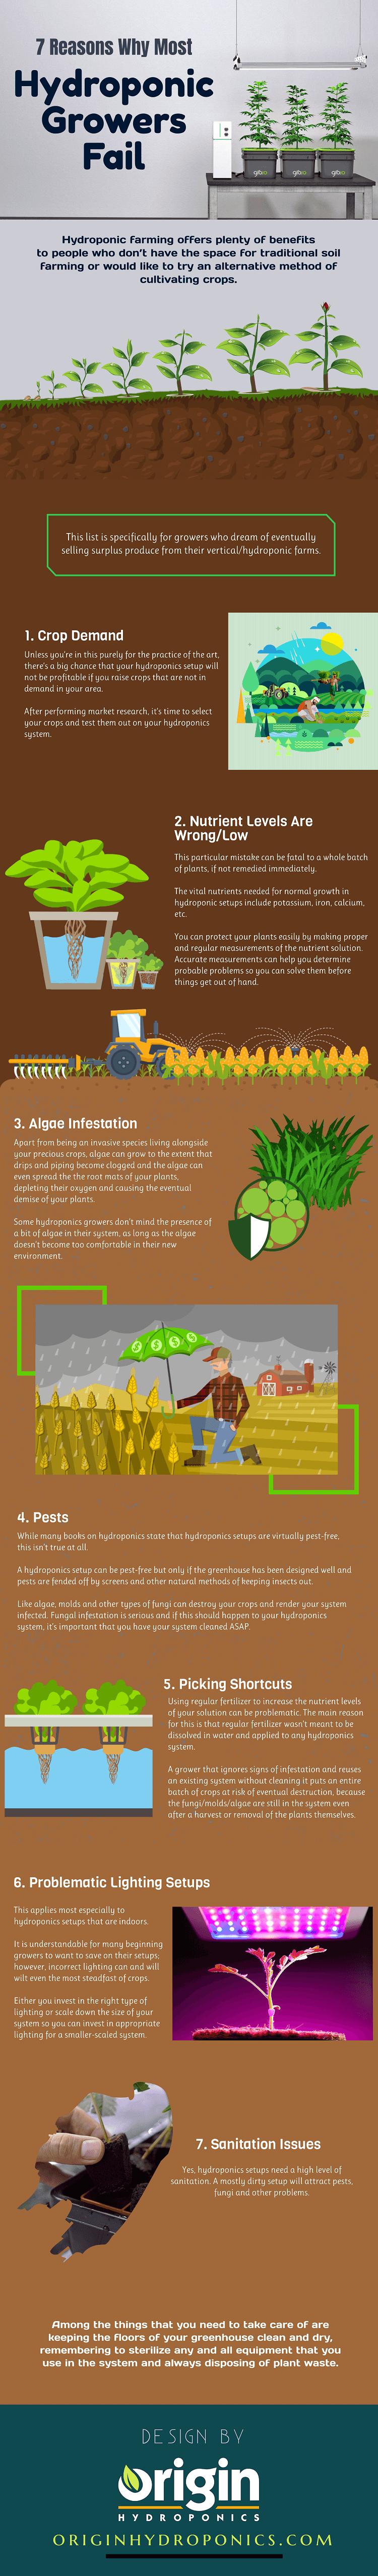 hydroponics infographic